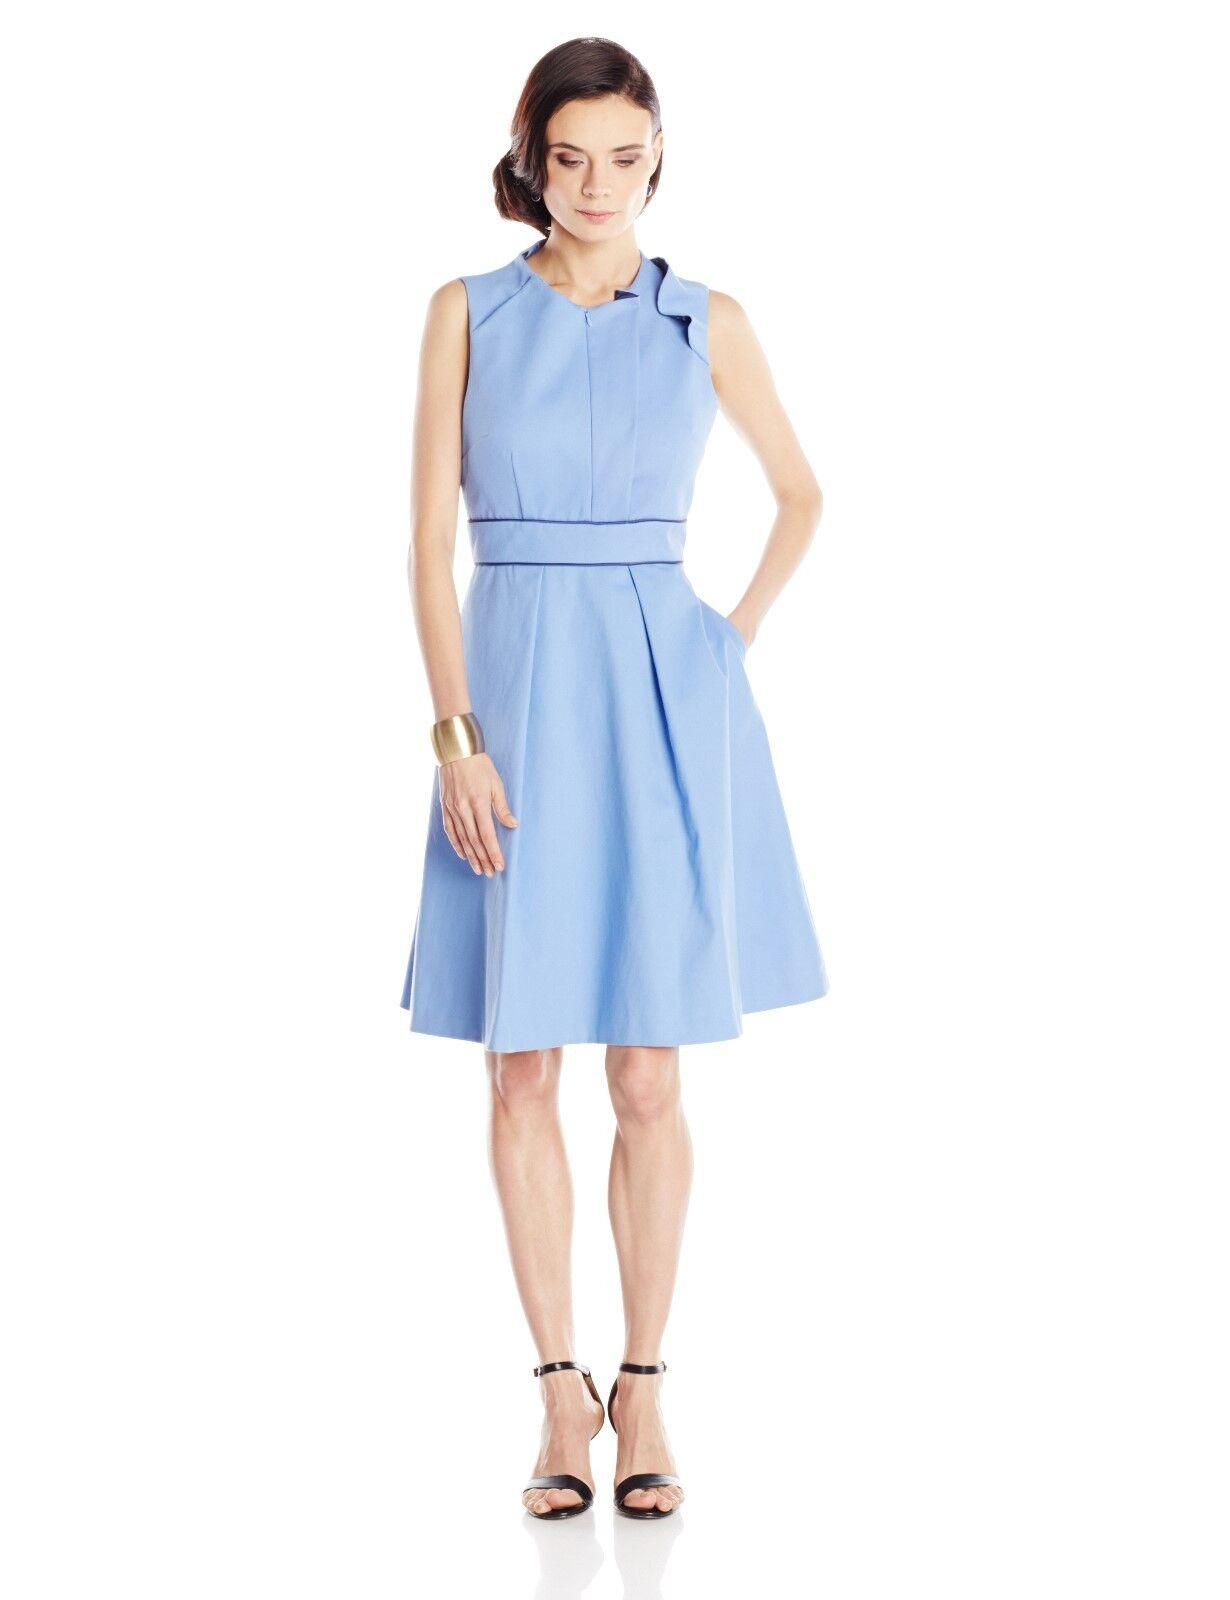 Amicia Bella Jennifer Knee Length Dress with Pockets - Blau - Größe 6 - Small